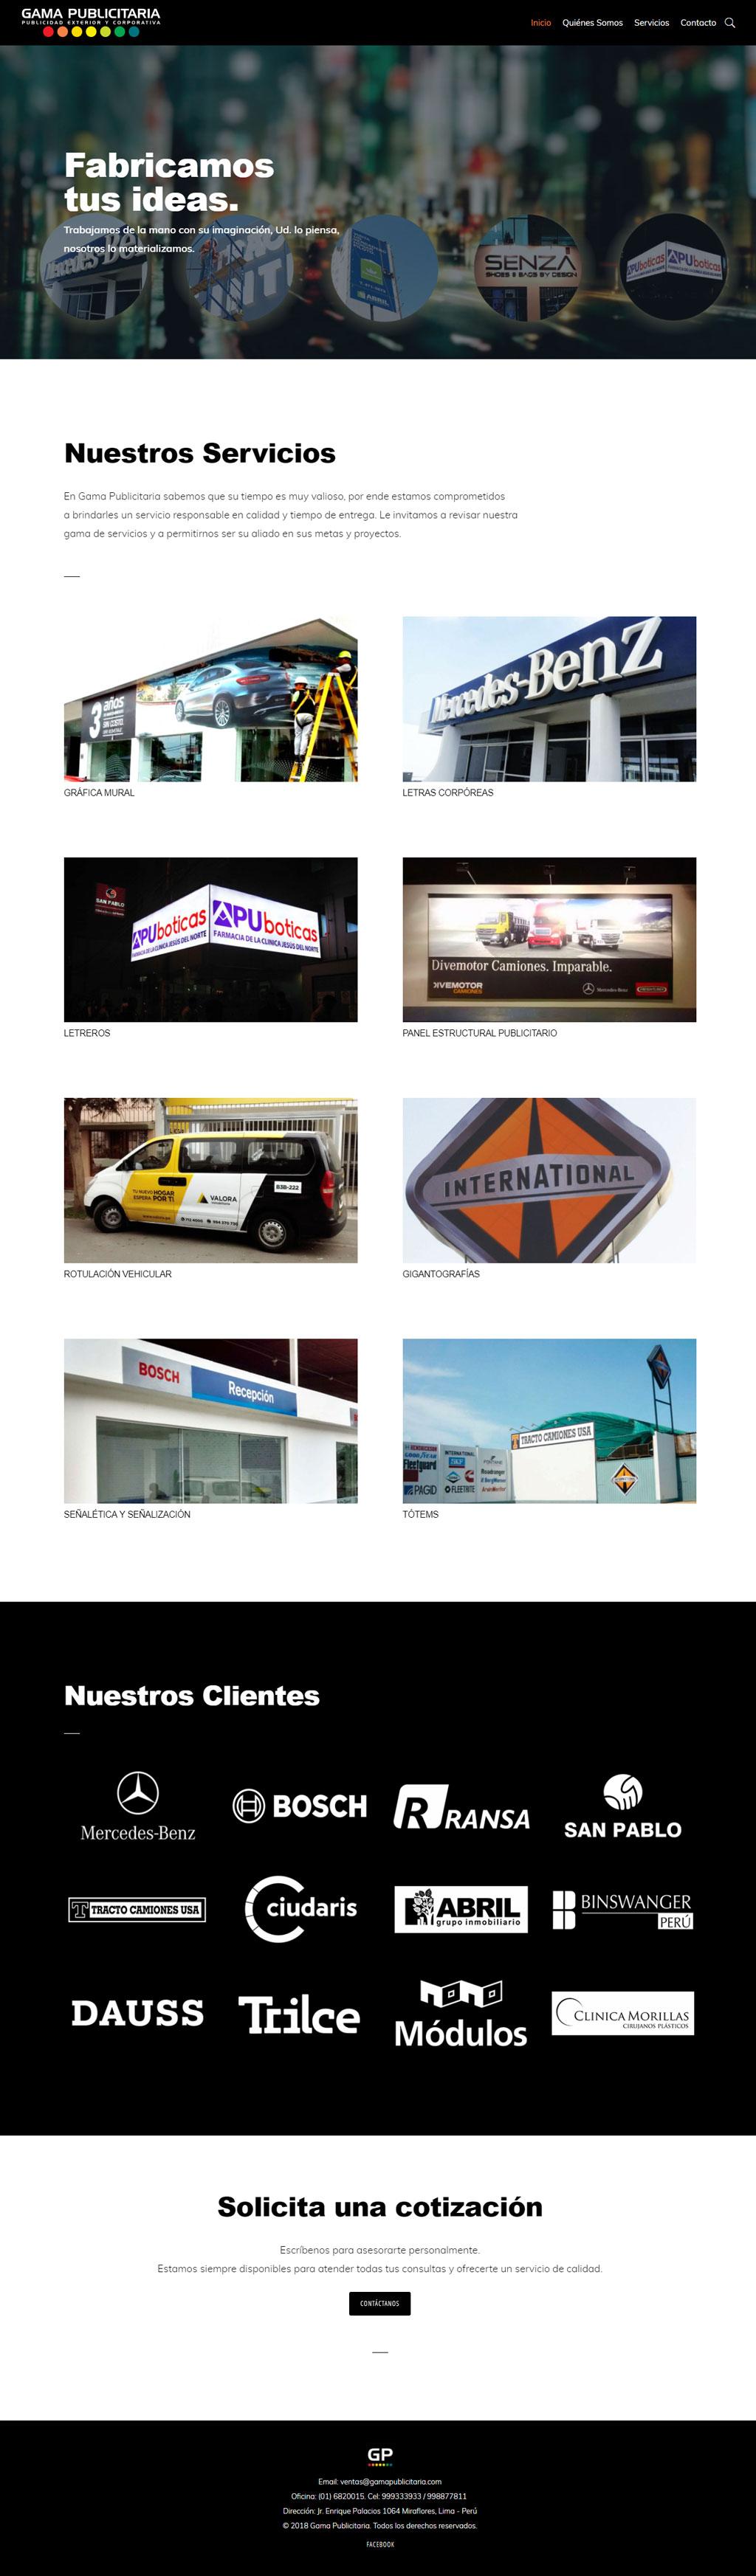 Gama Publicitaria - Home Page